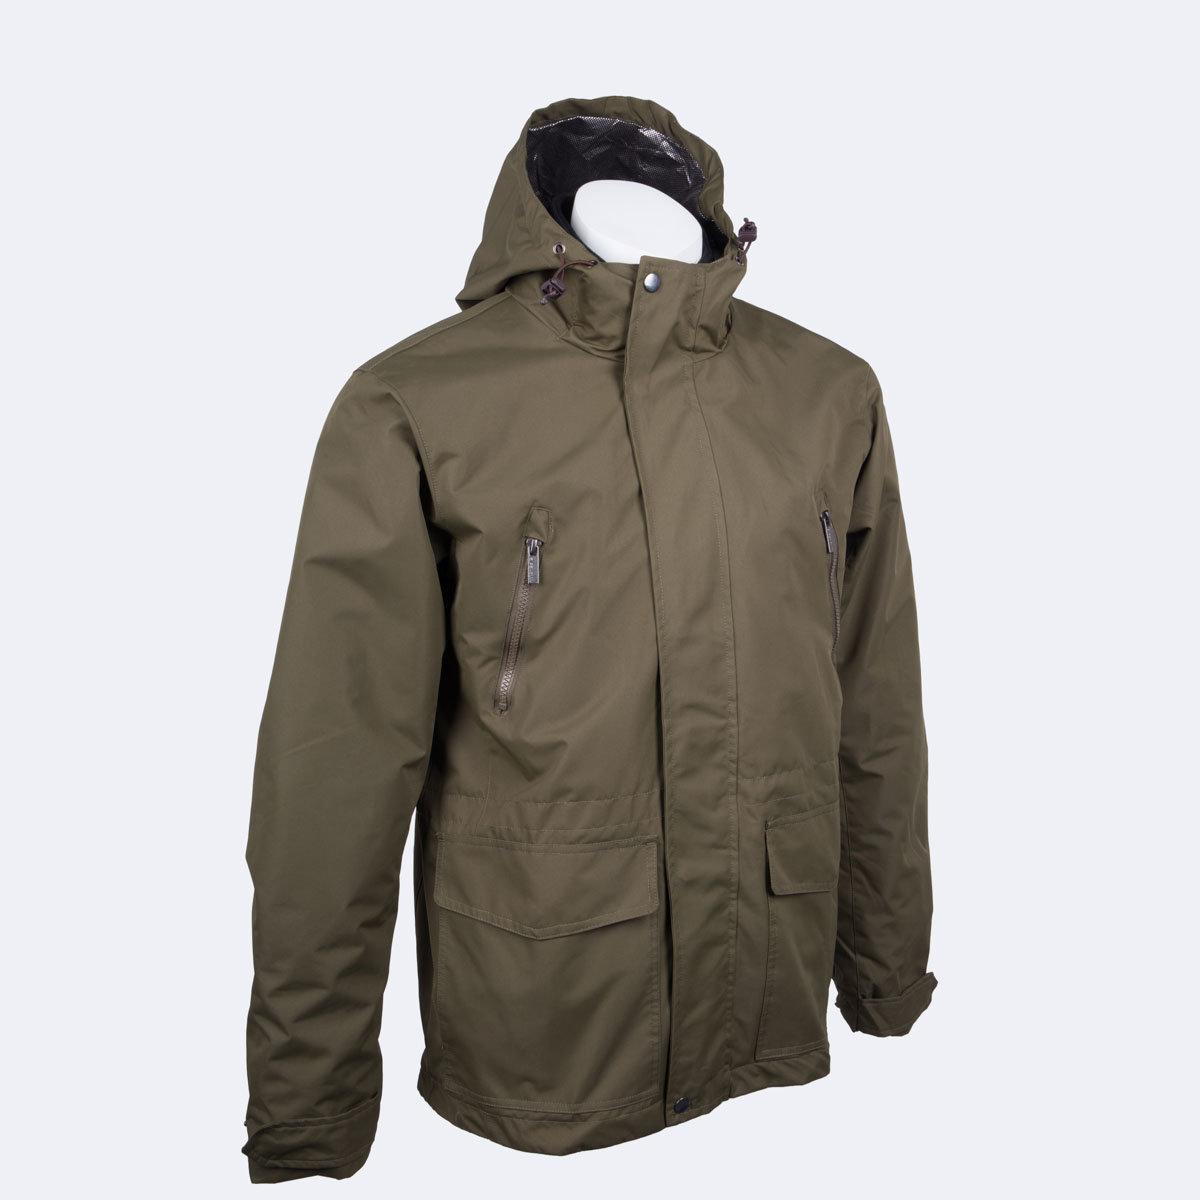 Men's 2 in 1 Fleece Jacket [Mountain Green] (EPIJ1835M-32)